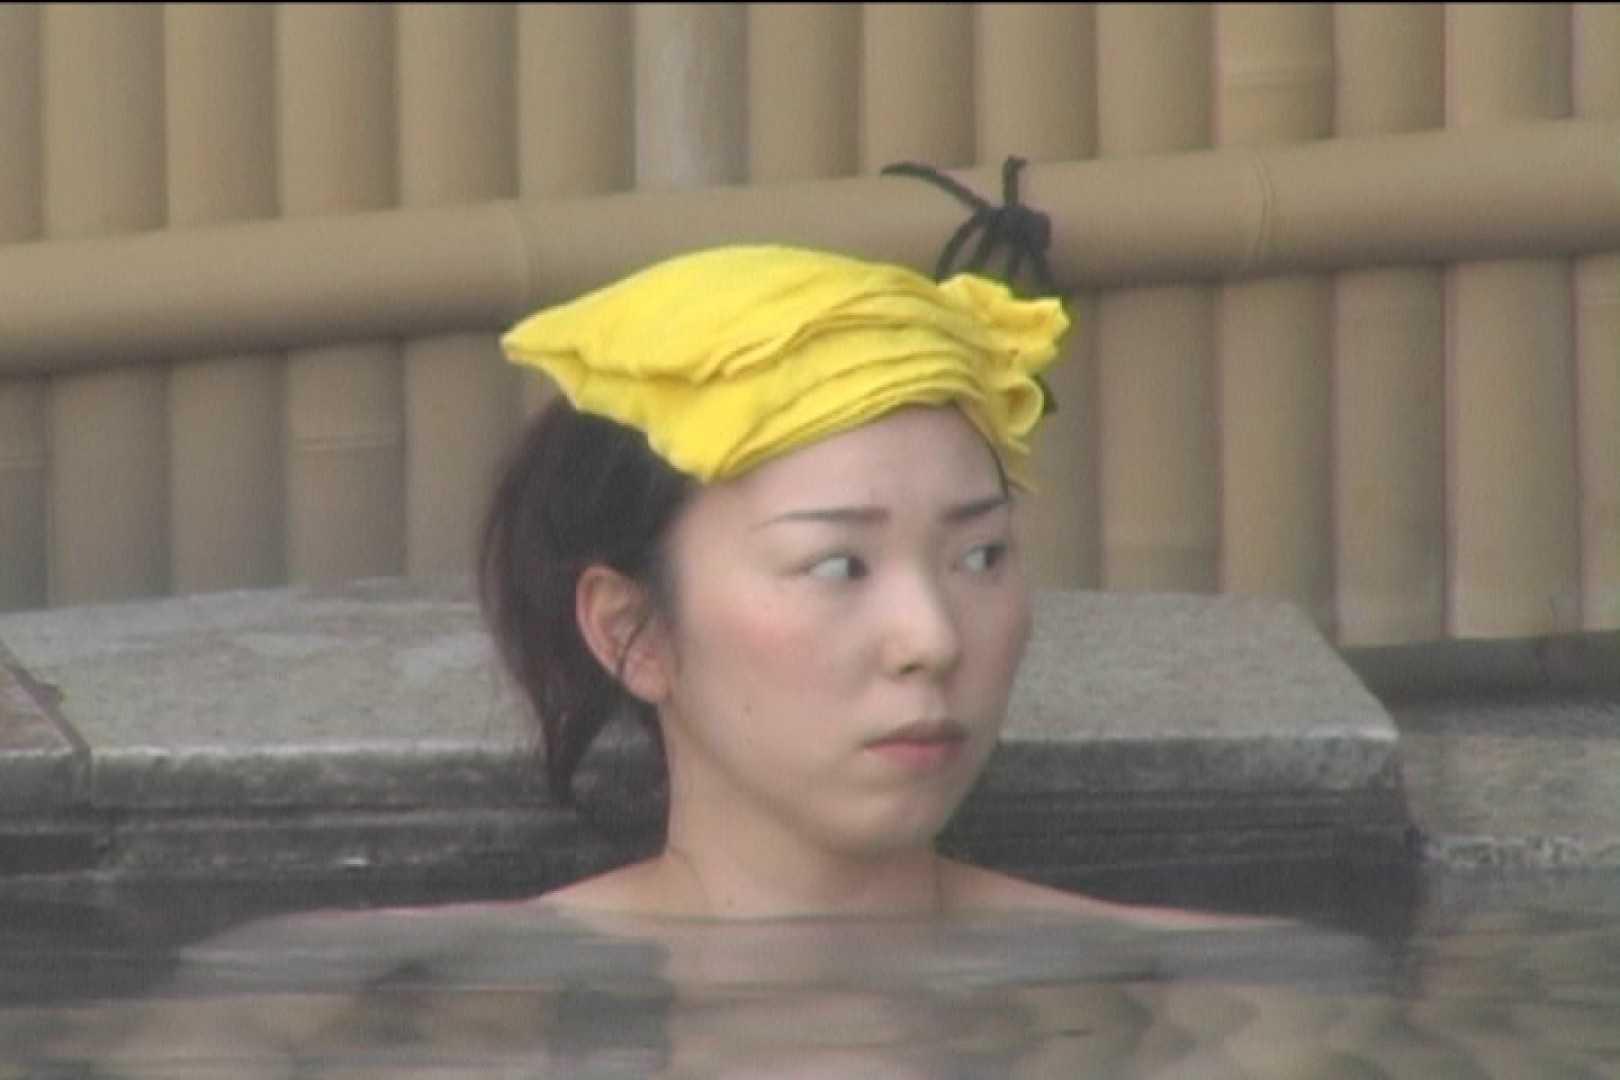 Aquaな露天風呂Vol.529 OLのエロ生活 おめこ無修正画像 42連発 20